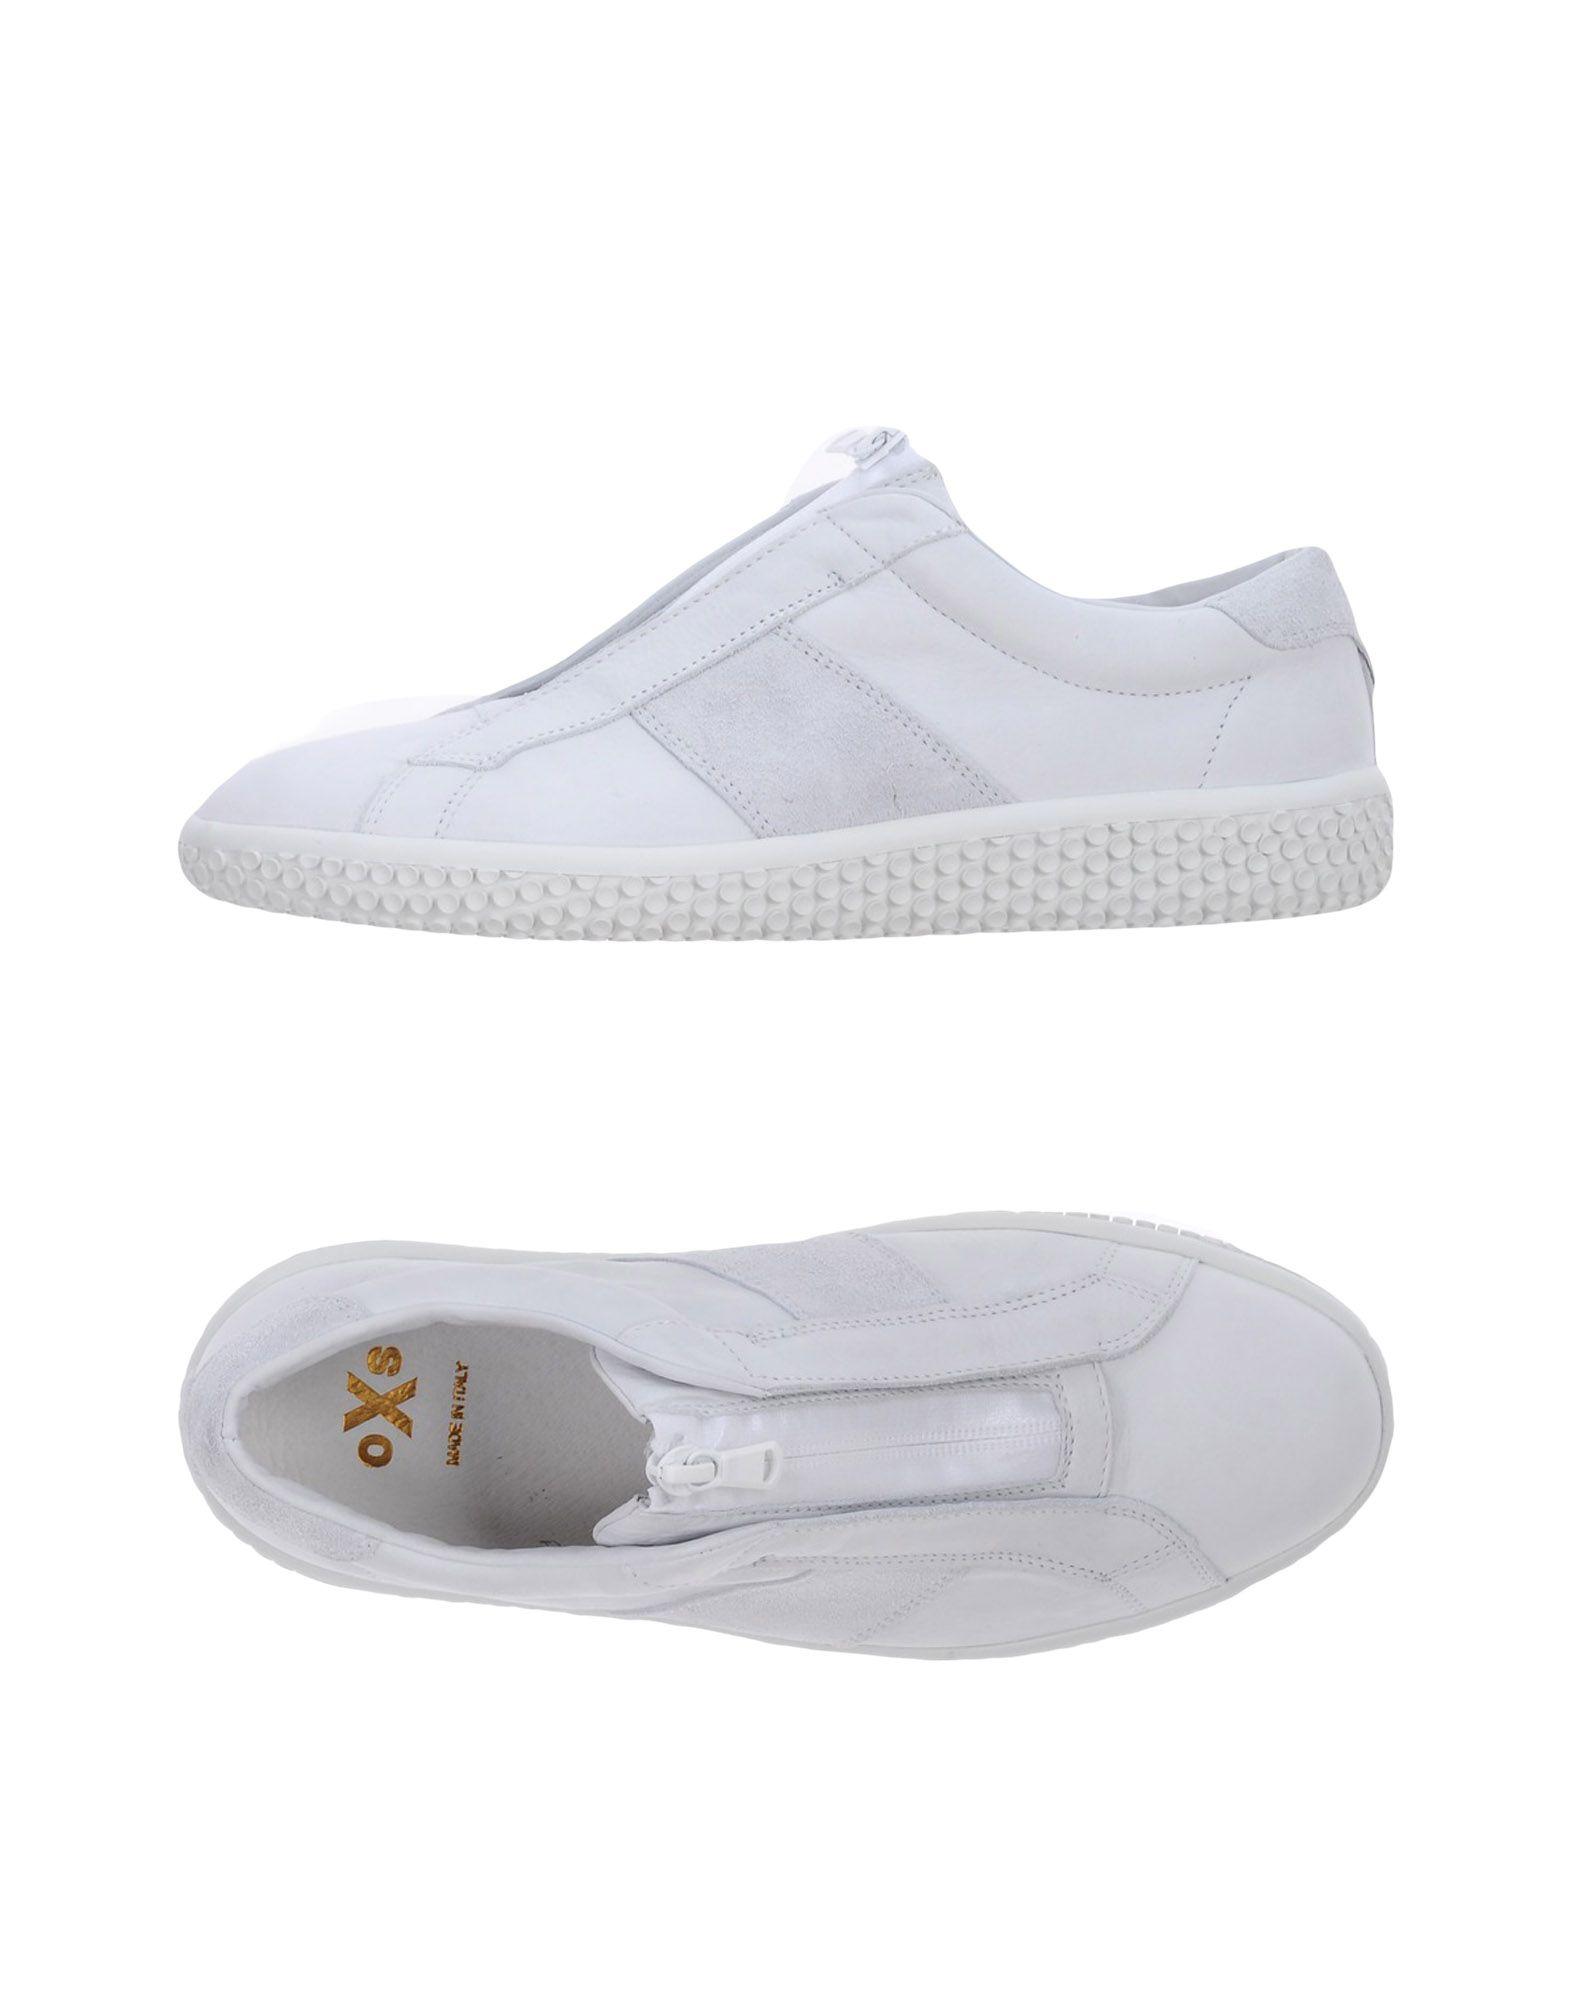 O.X.S. Sneakers online - Men O.X.S. Sneakers online Sneakers on  Australia - 11354936QB 0f90d3